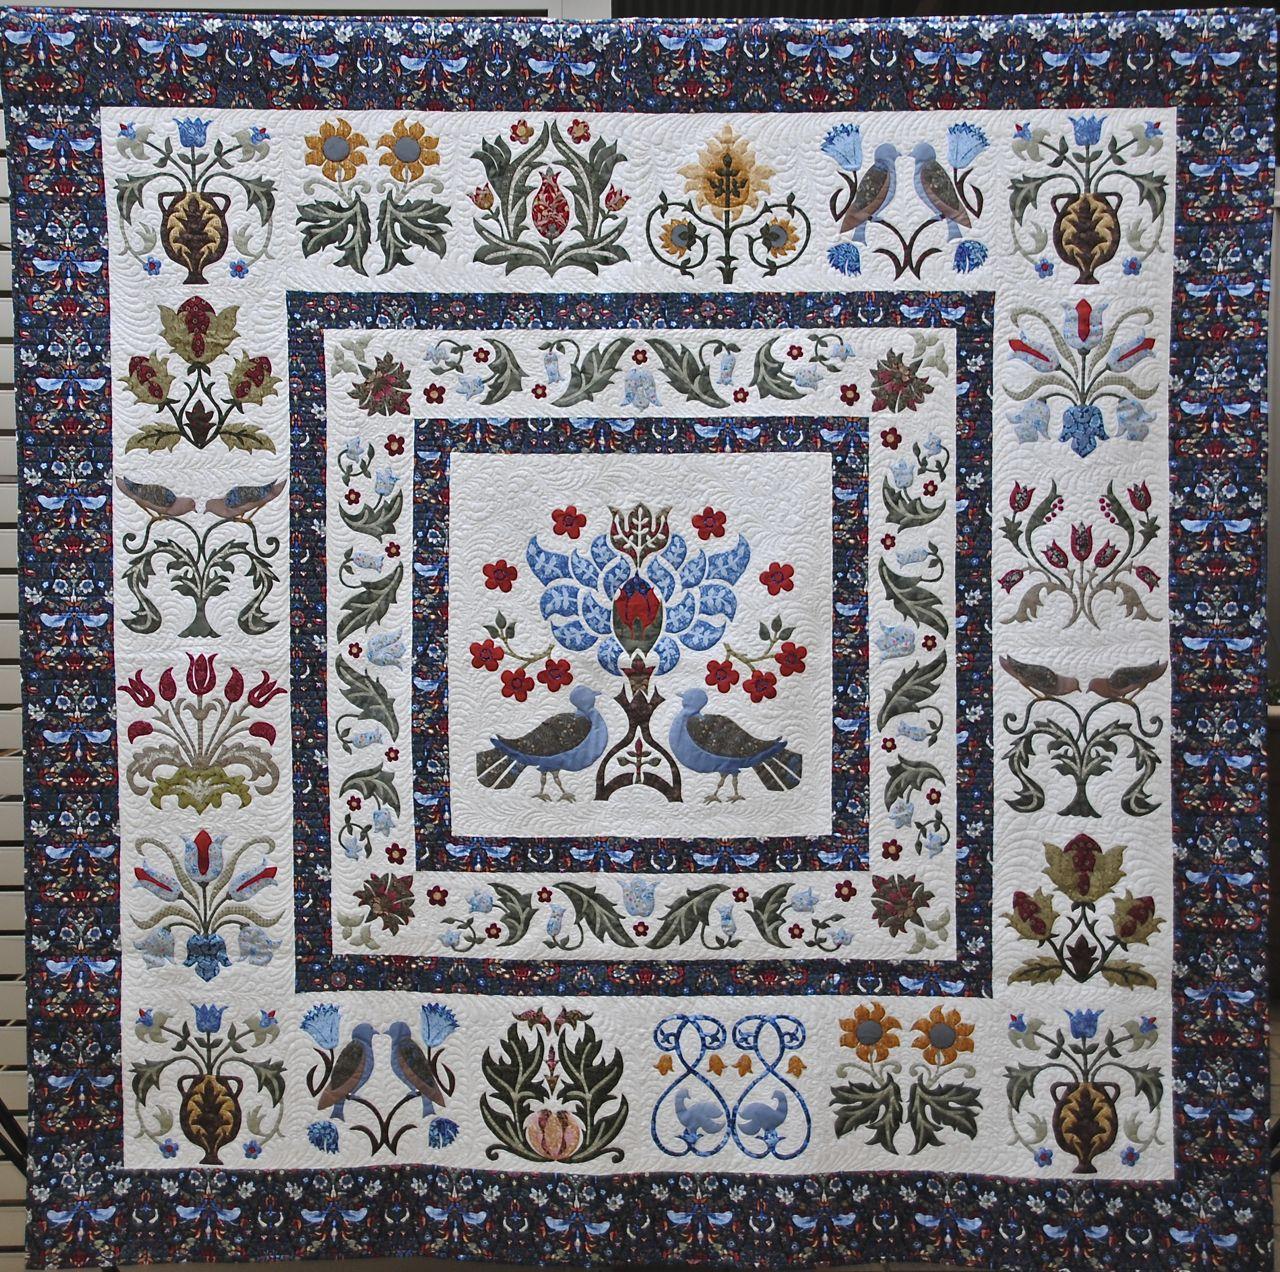 William Morris in Quilting: Quilt Gallery and Patterns : william morris quilt patterns - Adamdwight.com